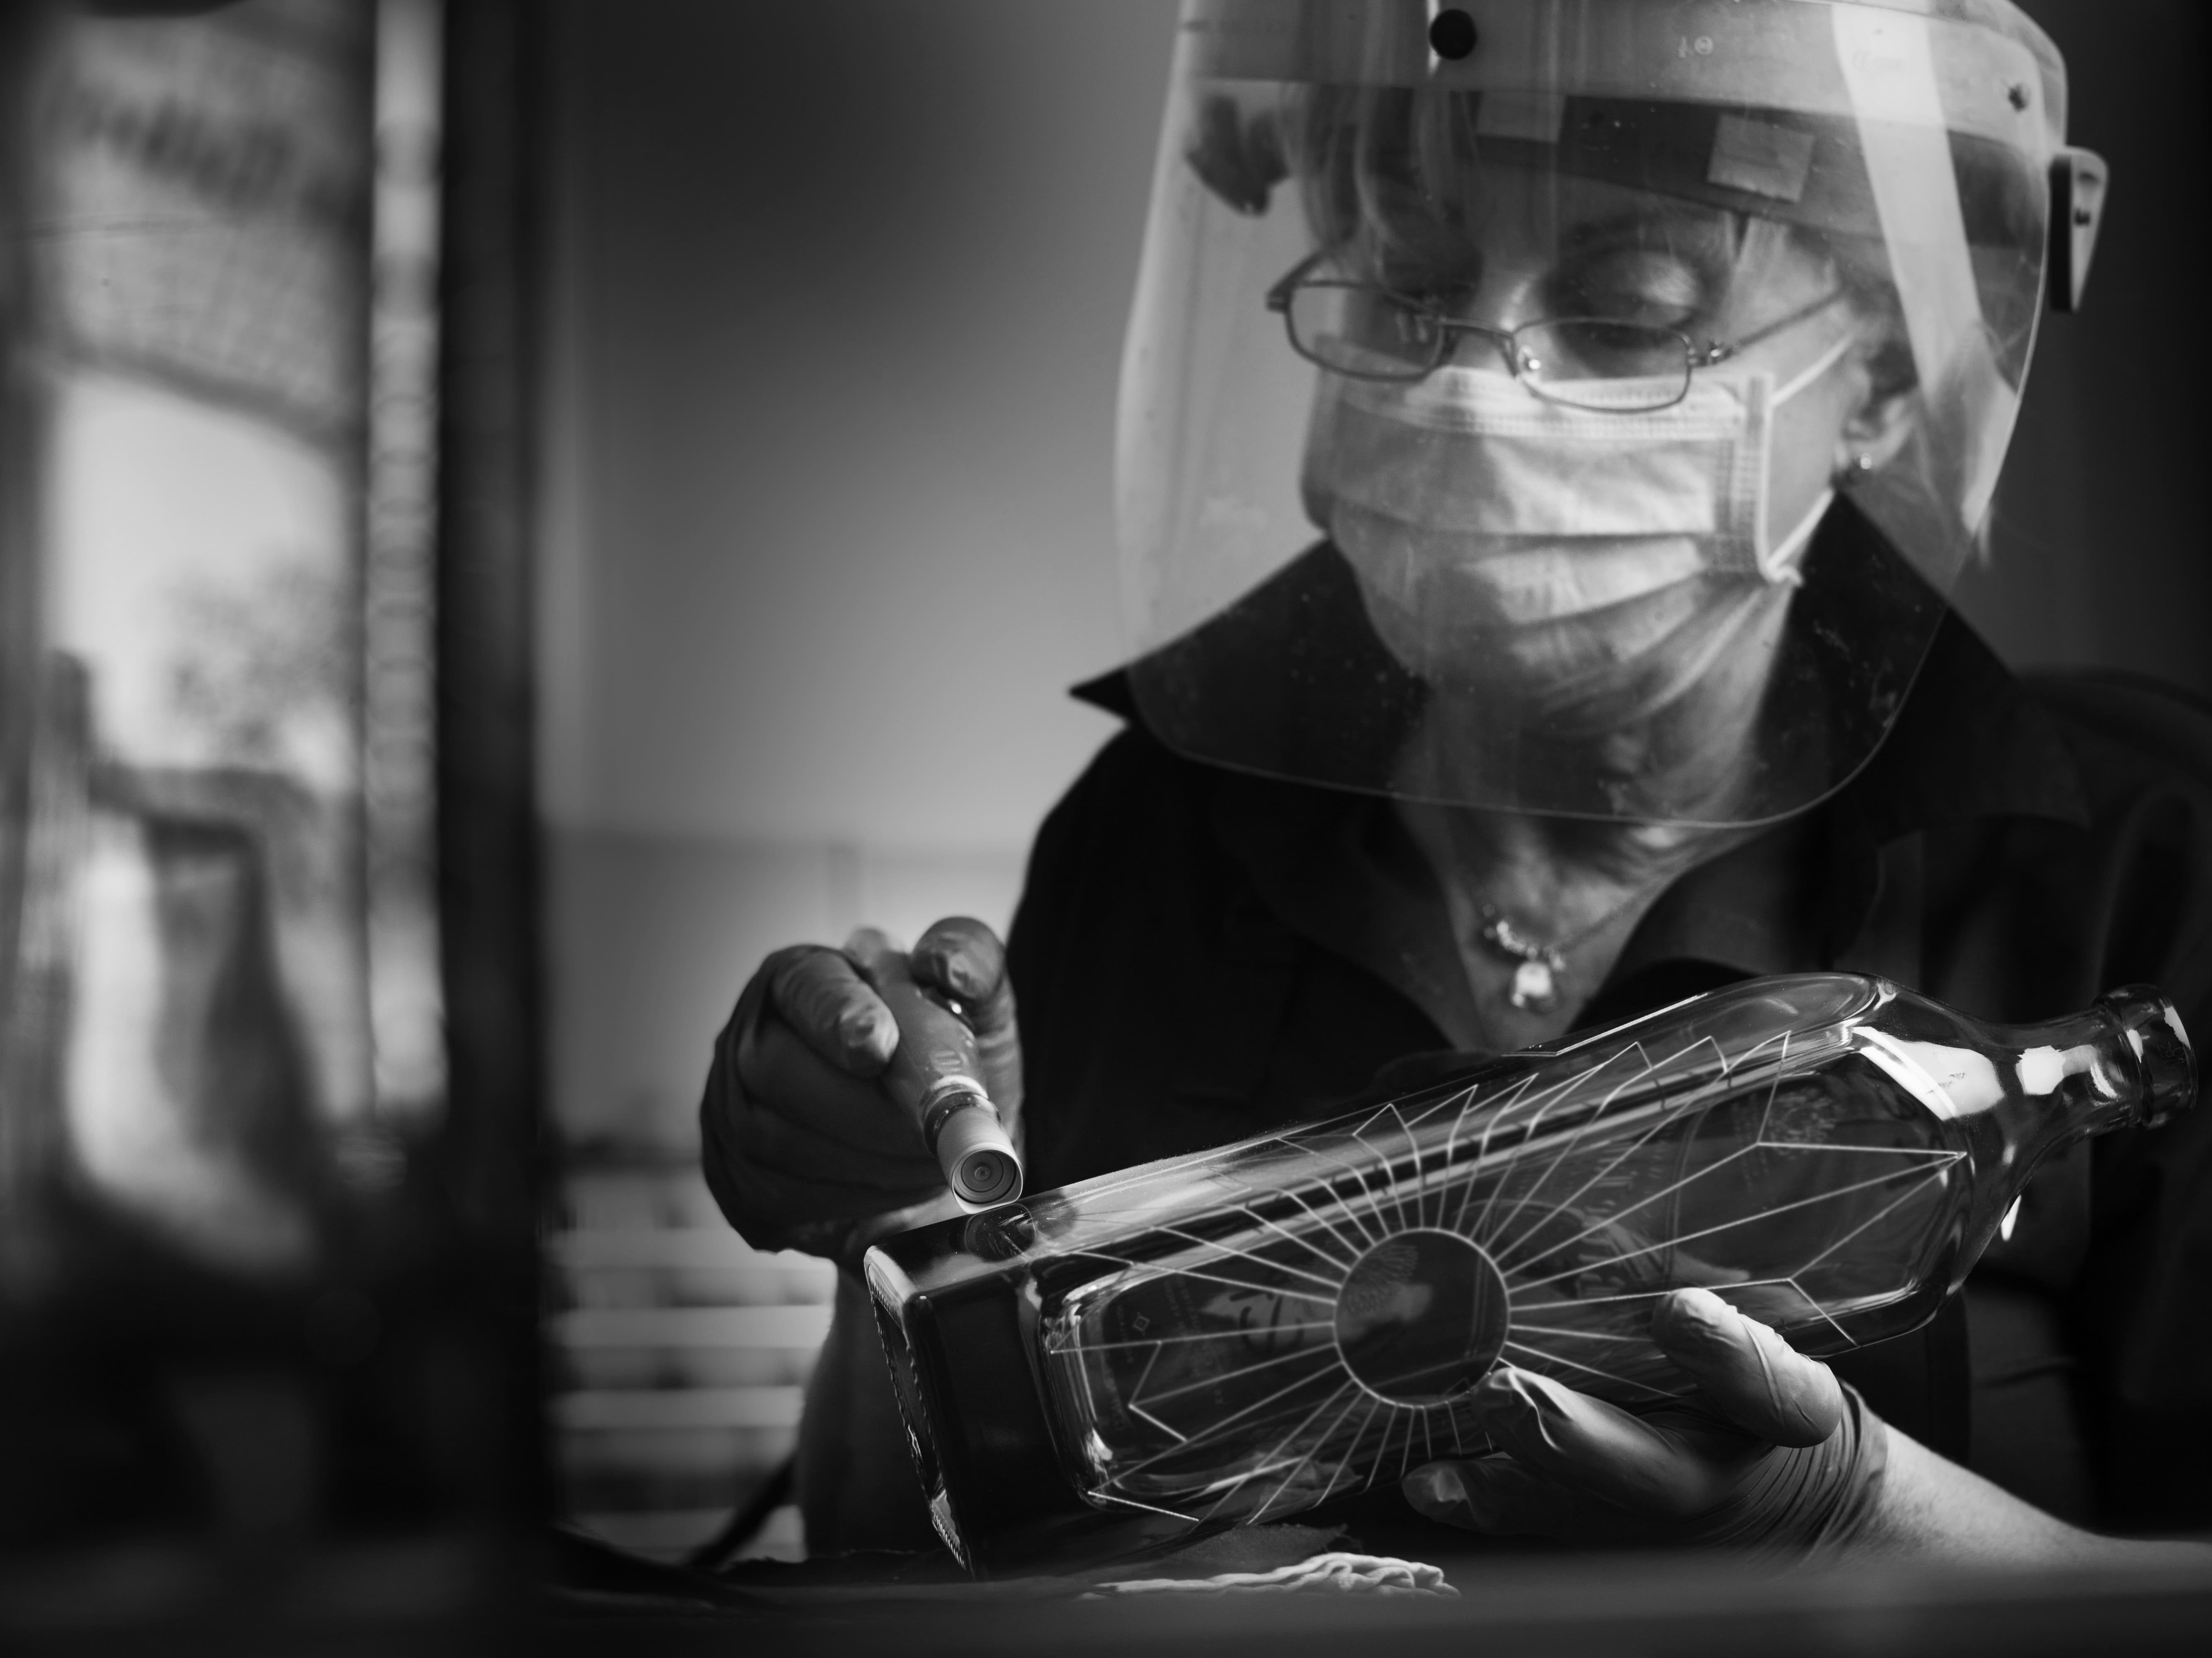 Glencairn decanter being engraved